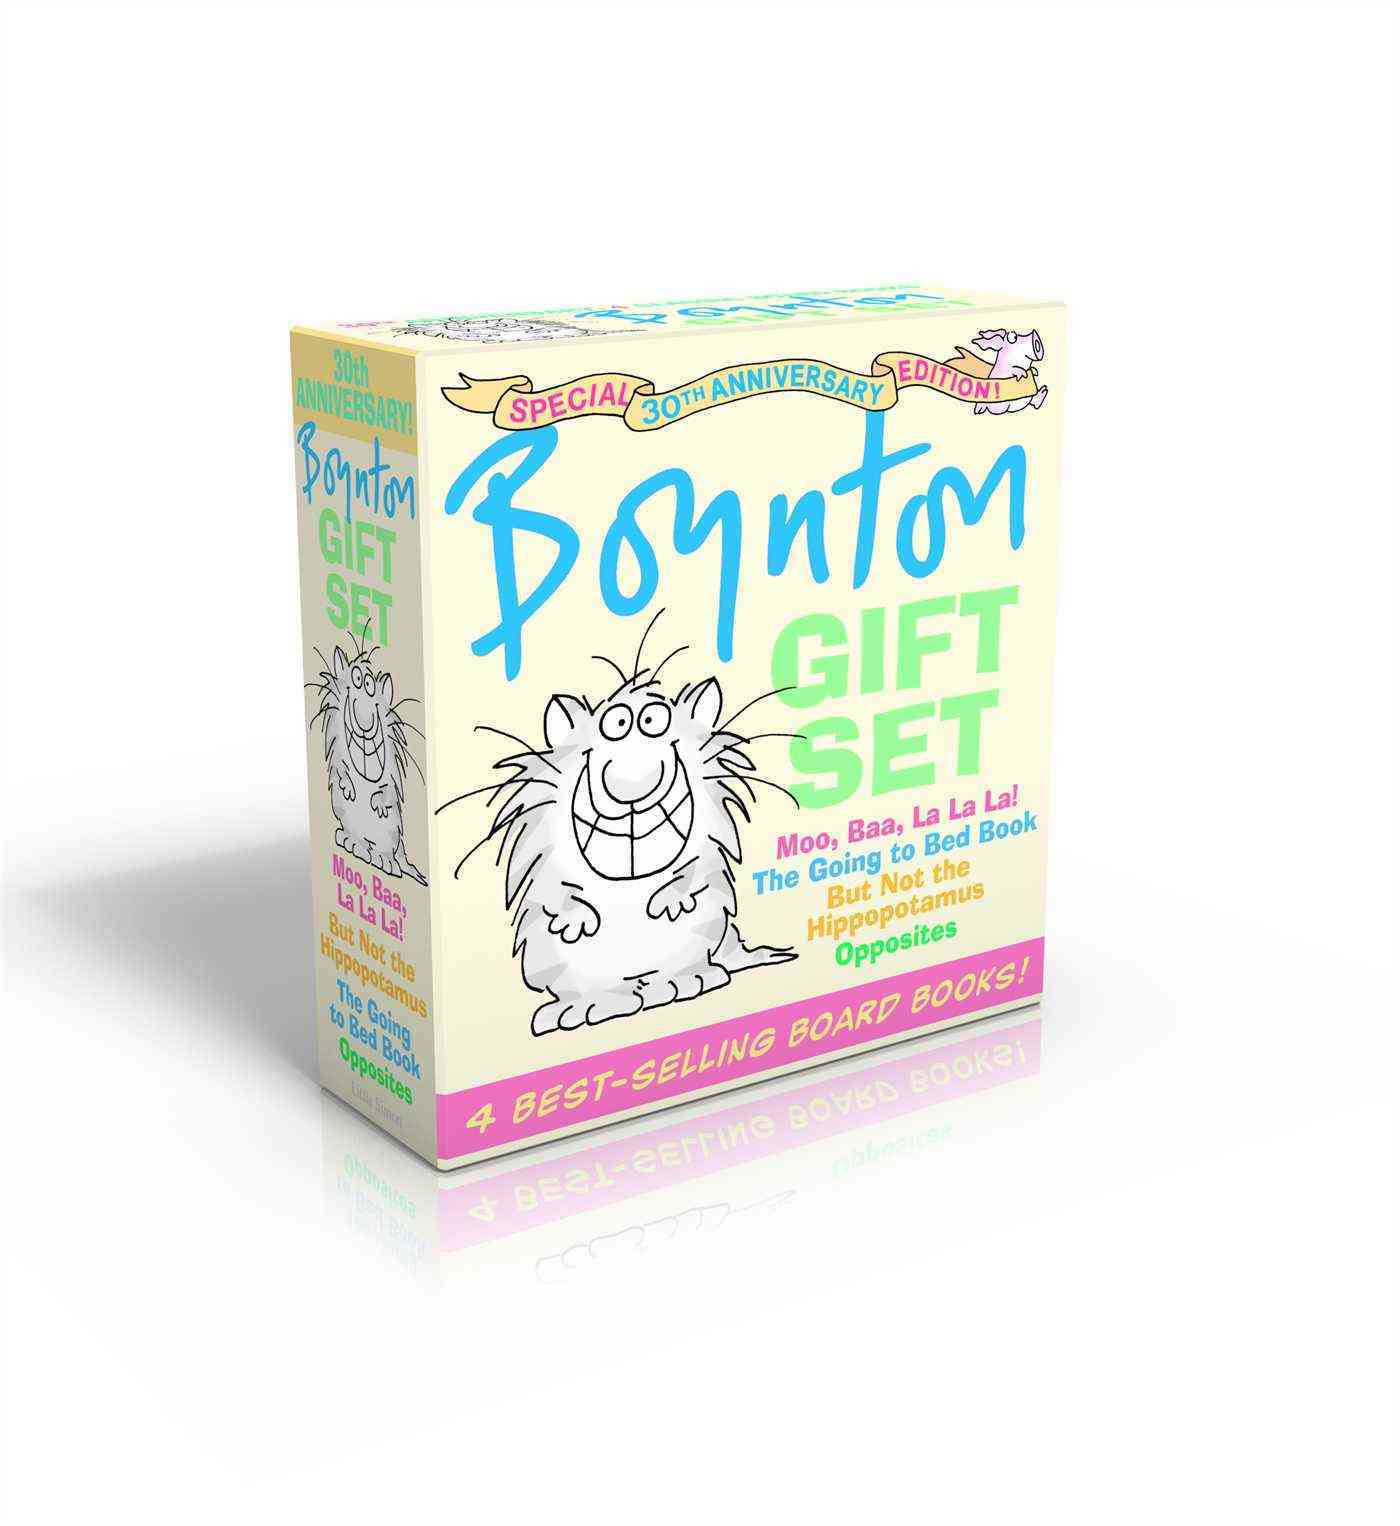 Boynton Gift Set: Moo, Baa, La La La!/ The Going to Bed Book/ But Not the Hippopotamus/ Opposites (Board book)